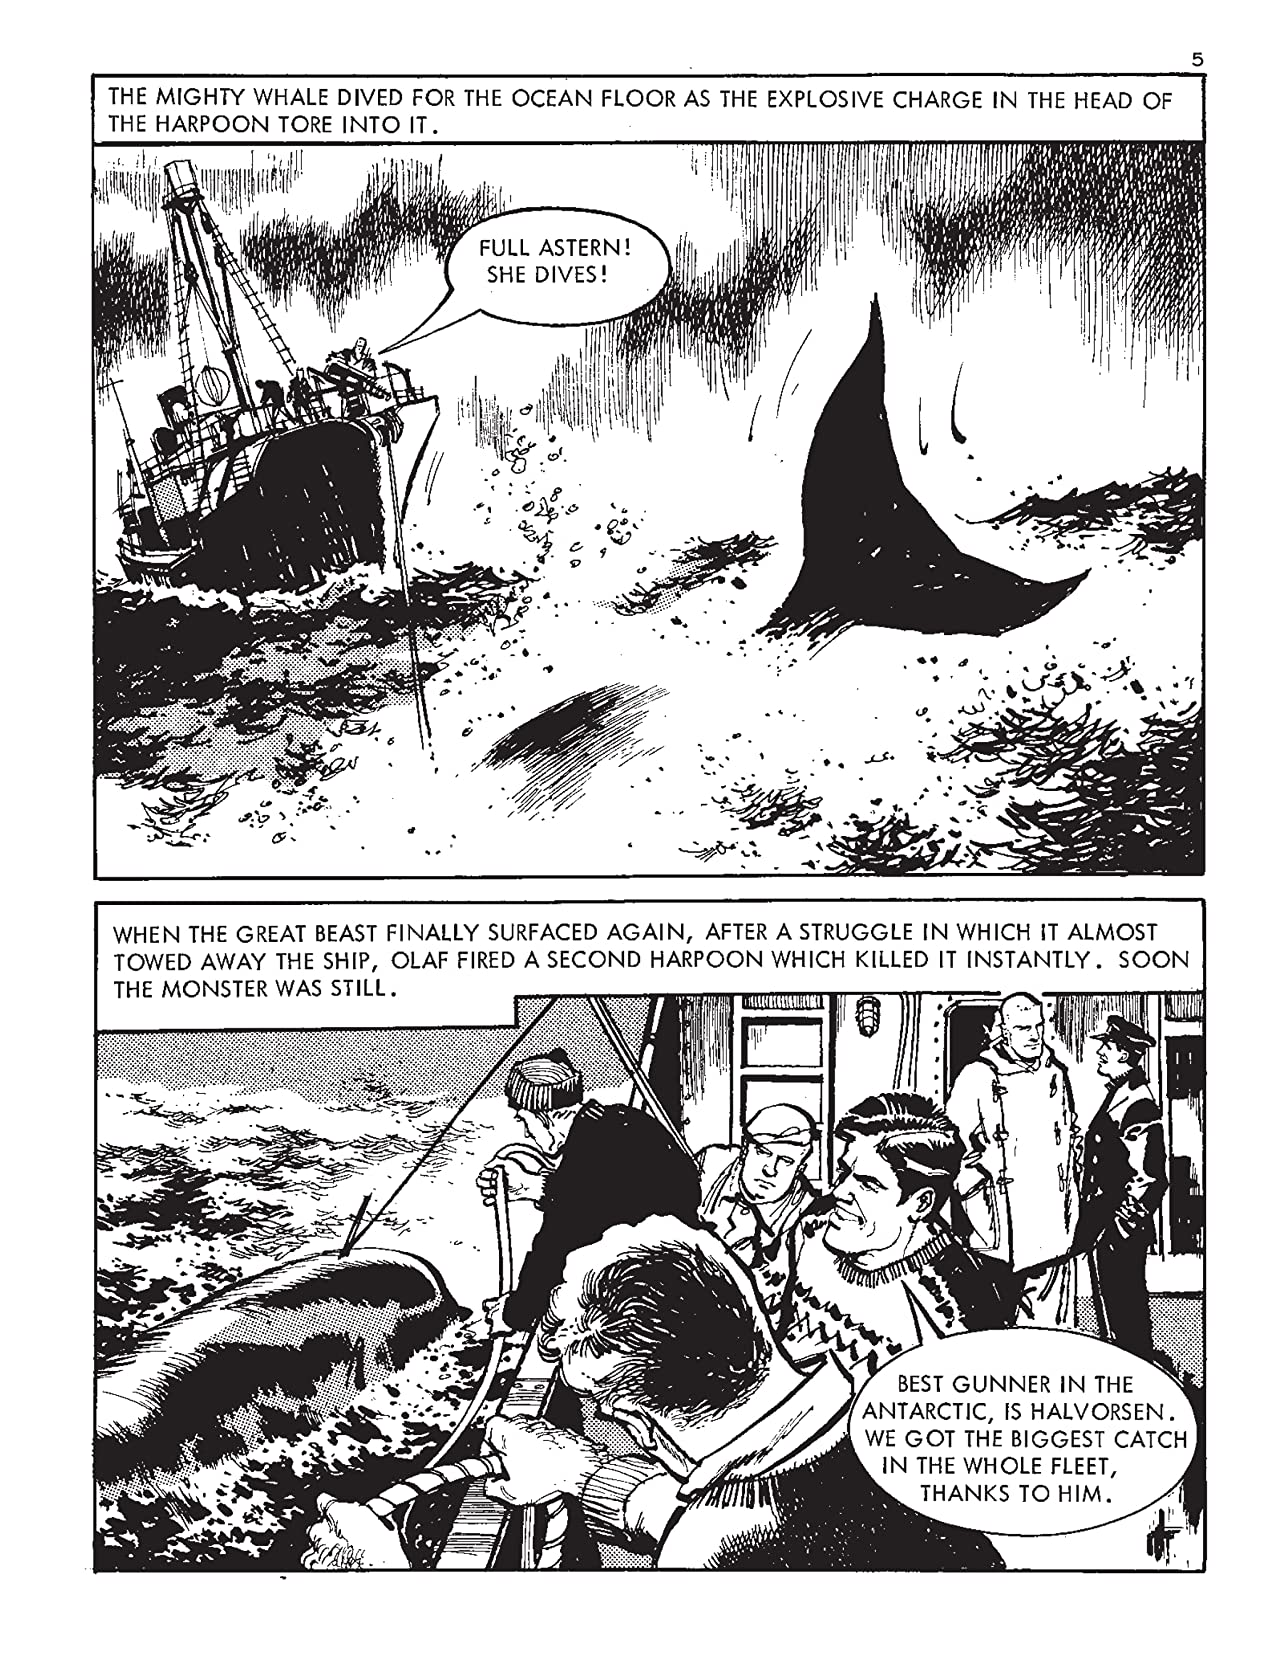 Commando #5164: Death Of A U-Boat